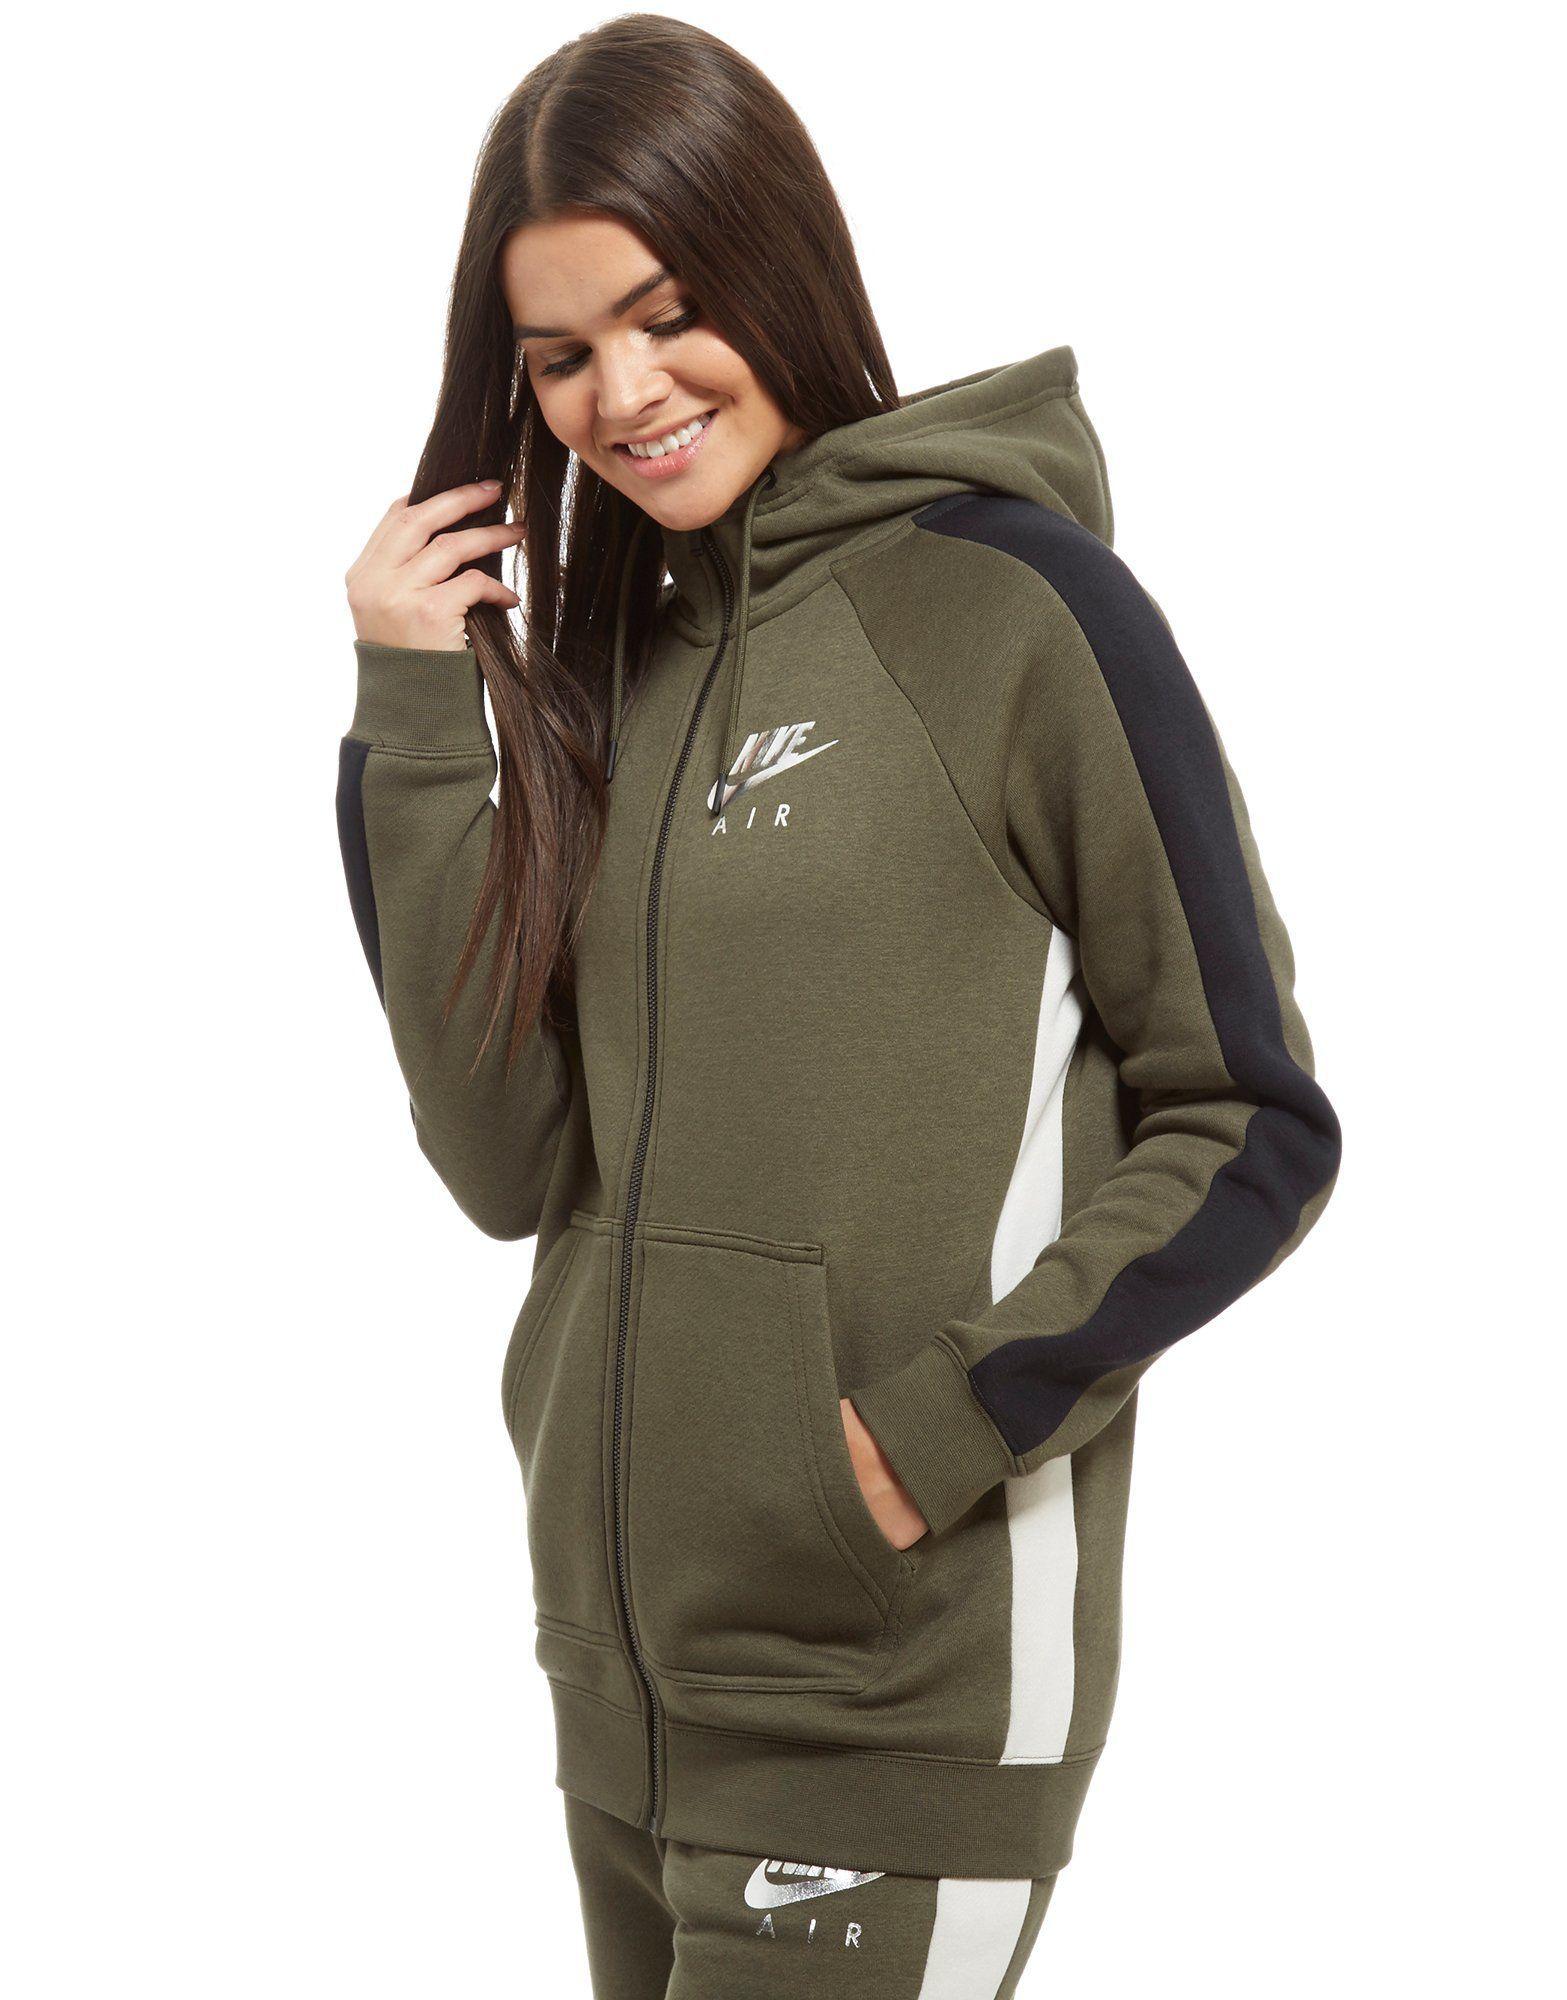 7a389dc30e72 Nike Veste zippée à capuche Air Femme – Achète en ligne Nike Veste zippée à  capuche